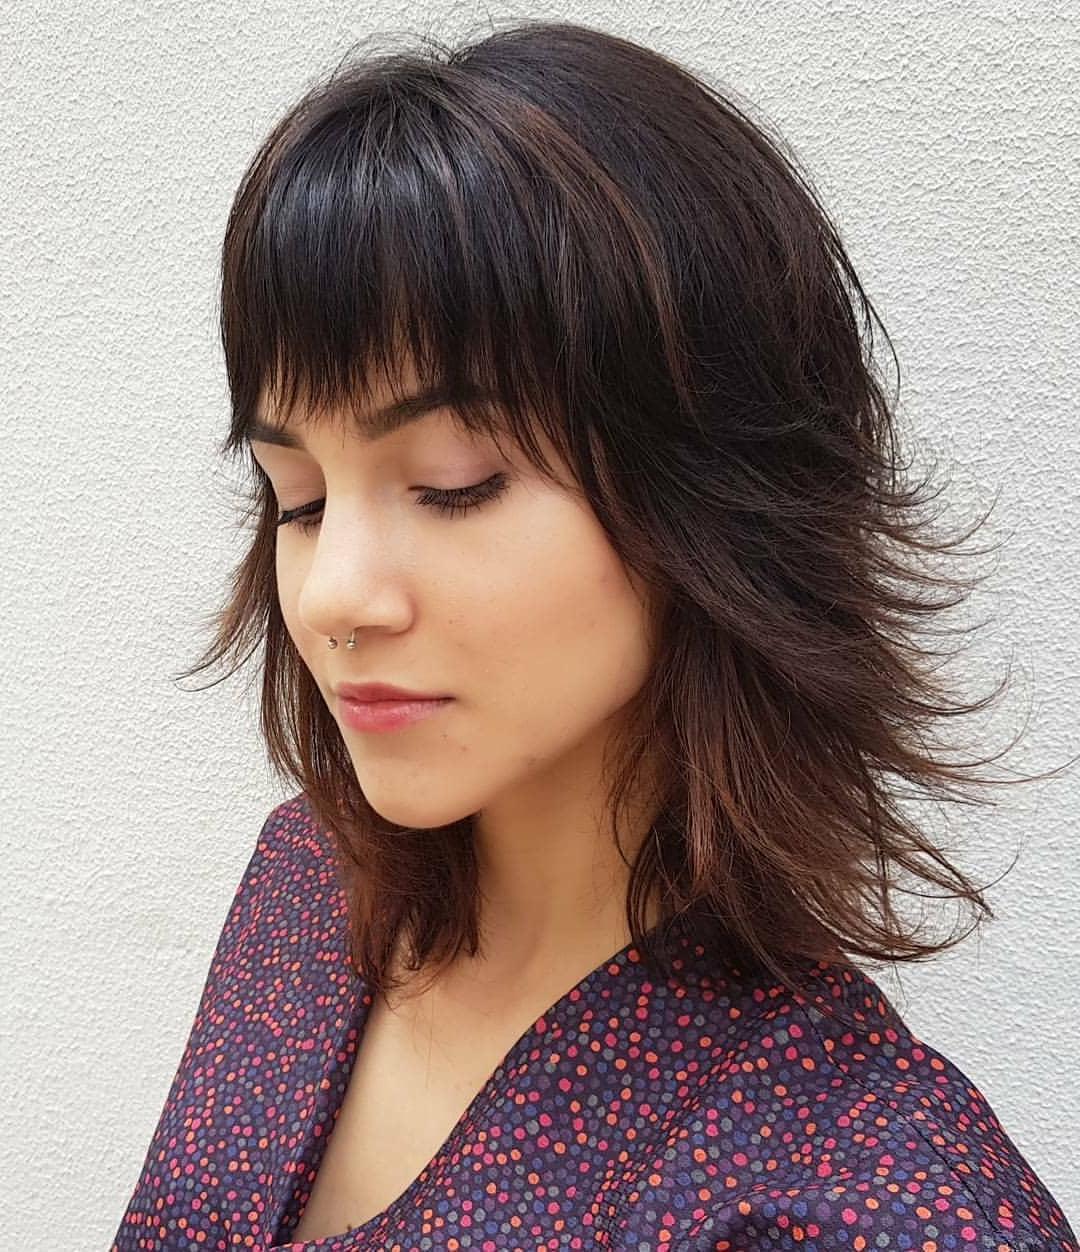 Most Popular Medium Hairstyles Regarding 10 Super Cute And Easy Medium Hairstyles (View 9 of 20)